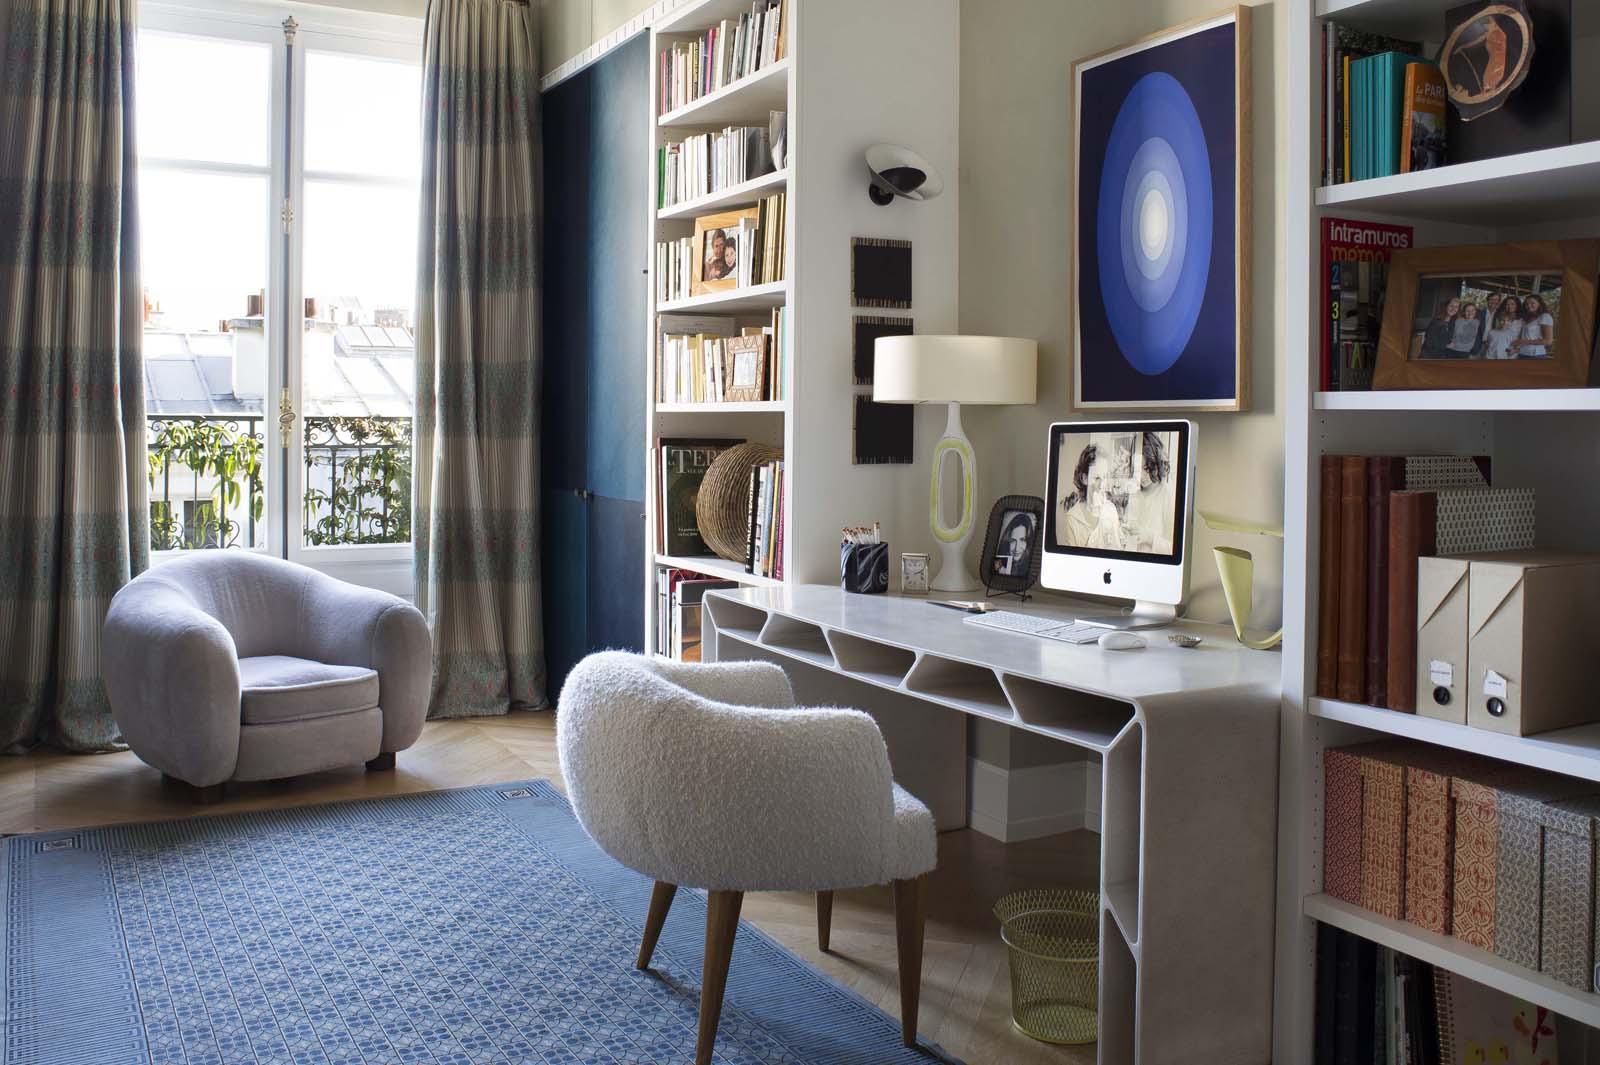 CSLB_SarkozyBourgois_AppartementParisC_JFJaussaud.14 (1).jpg